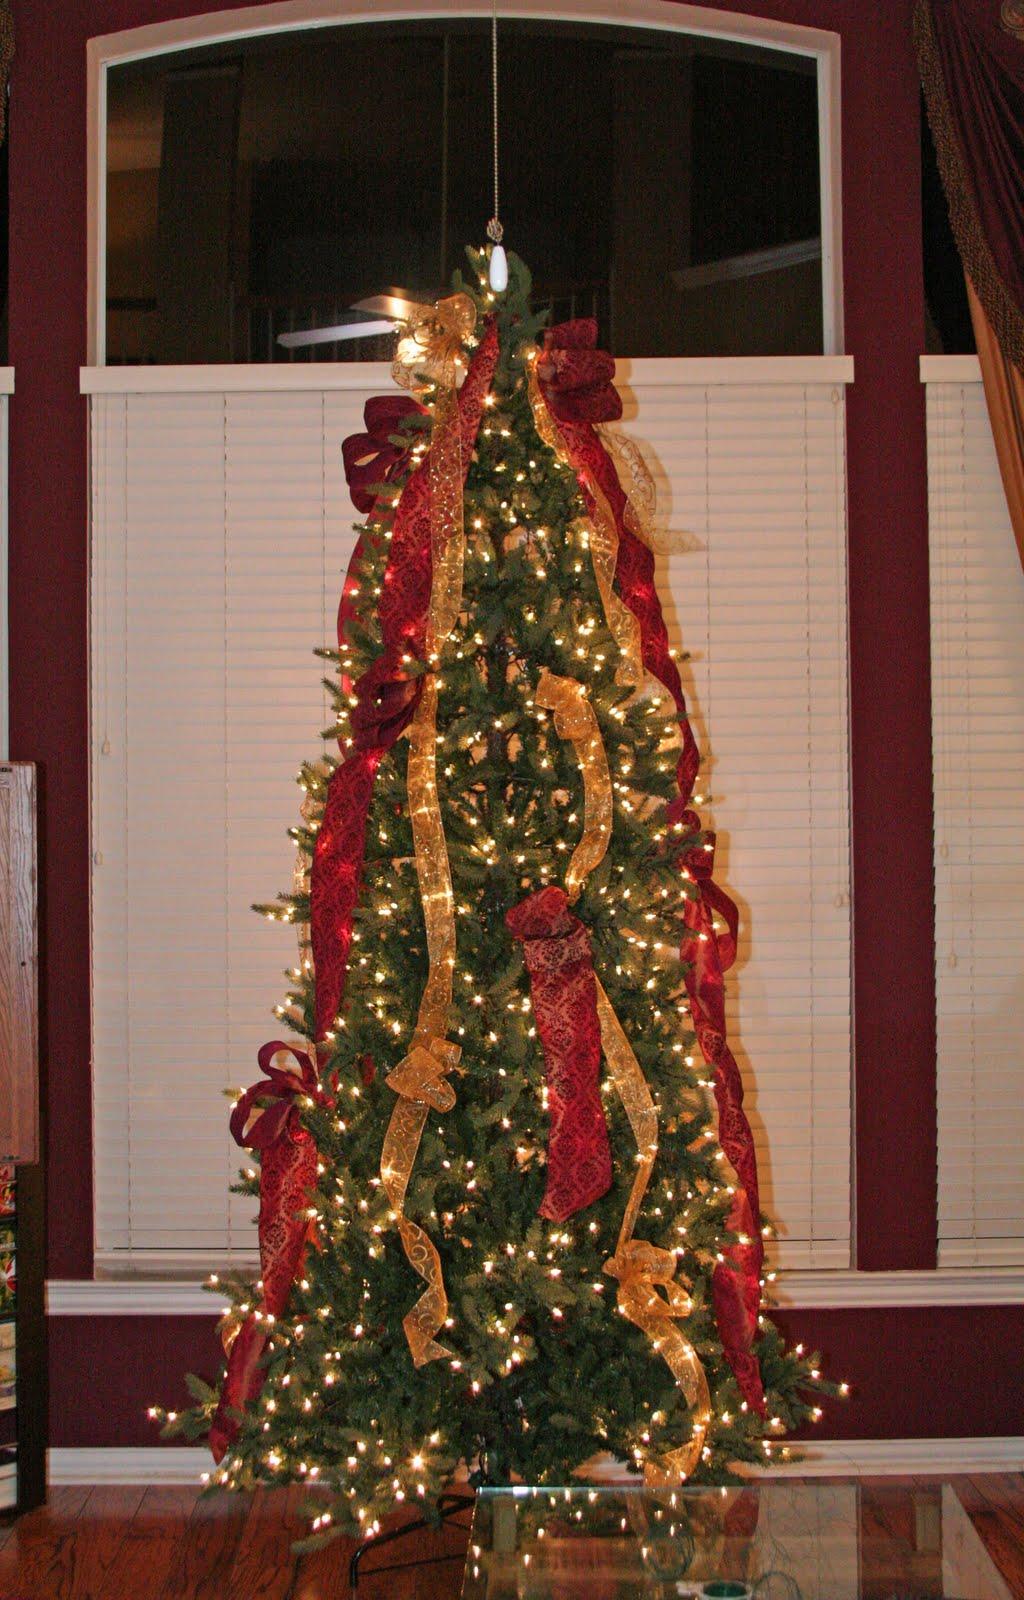 madblooms: Christmas Tree Decor: 101